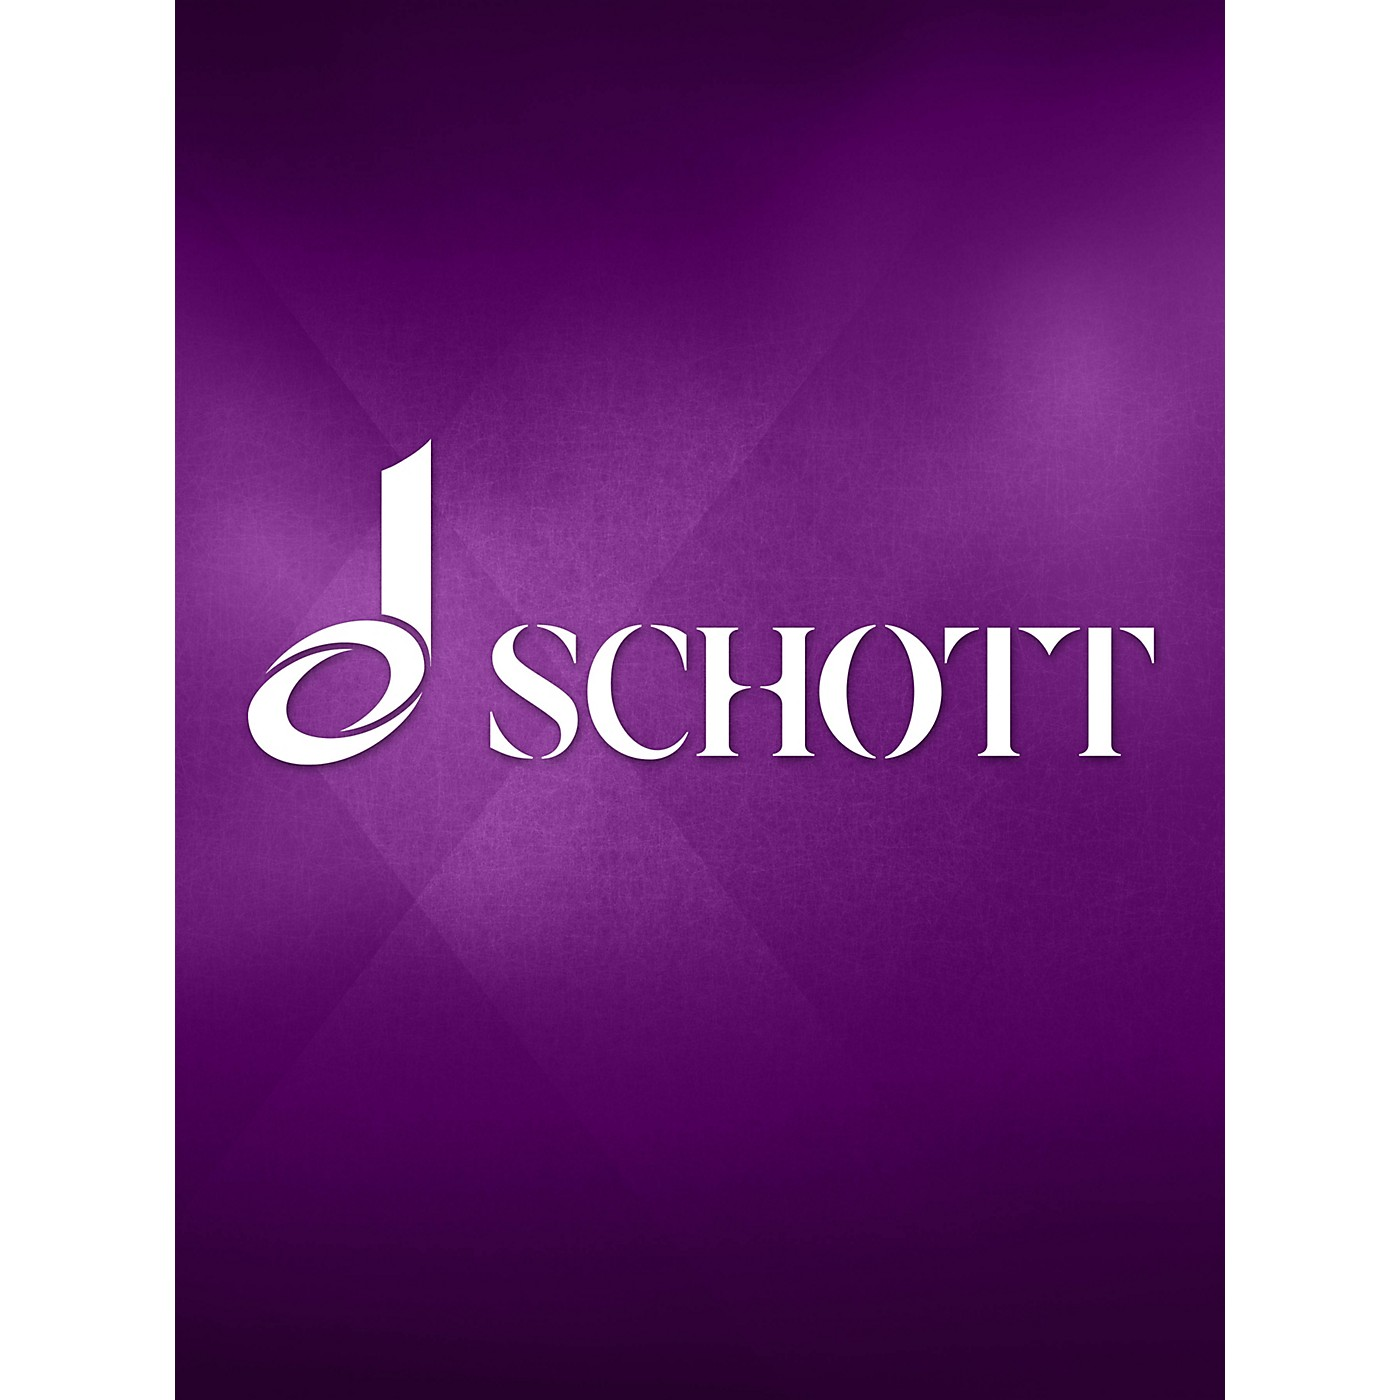 Hal Leonard Two(2)cantatas:lobet Den Hern/singet Dem Hern For Tenor (sop)trombone(cello), Organ Vocal Series thumbnail